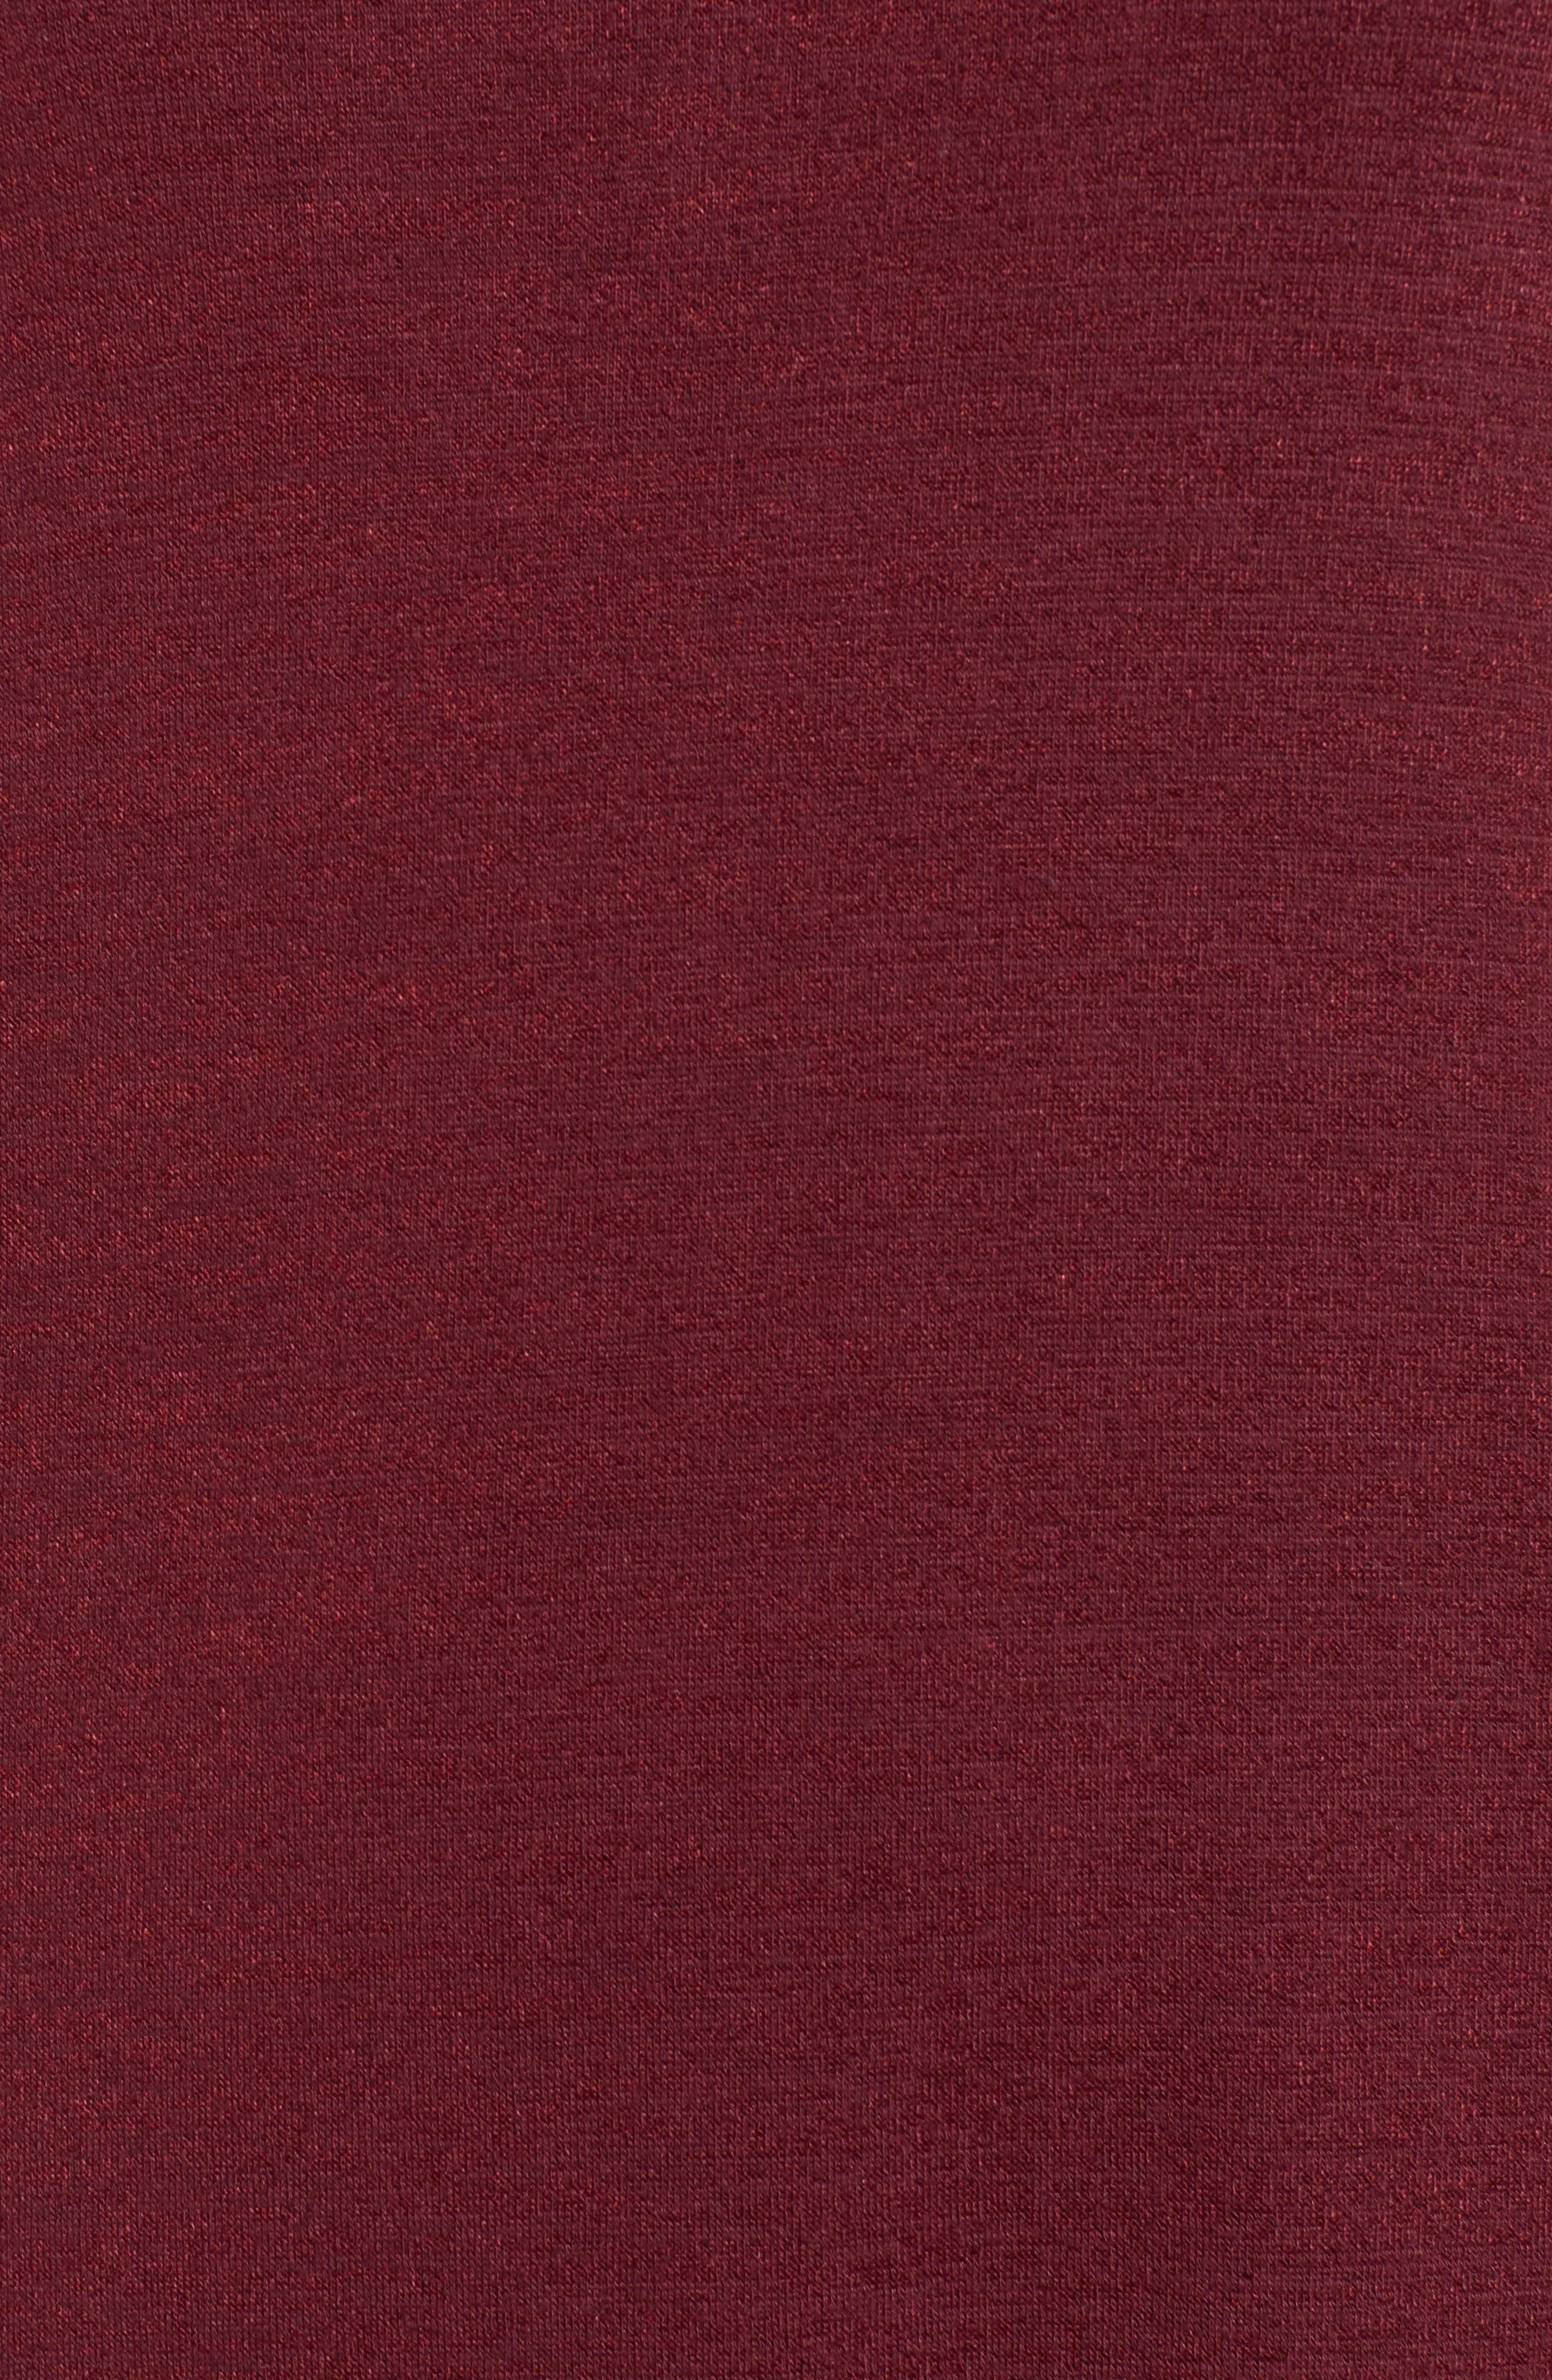 Tank Shift Dress,                             Alternate thumbnail 6, color,                             Red Tannin